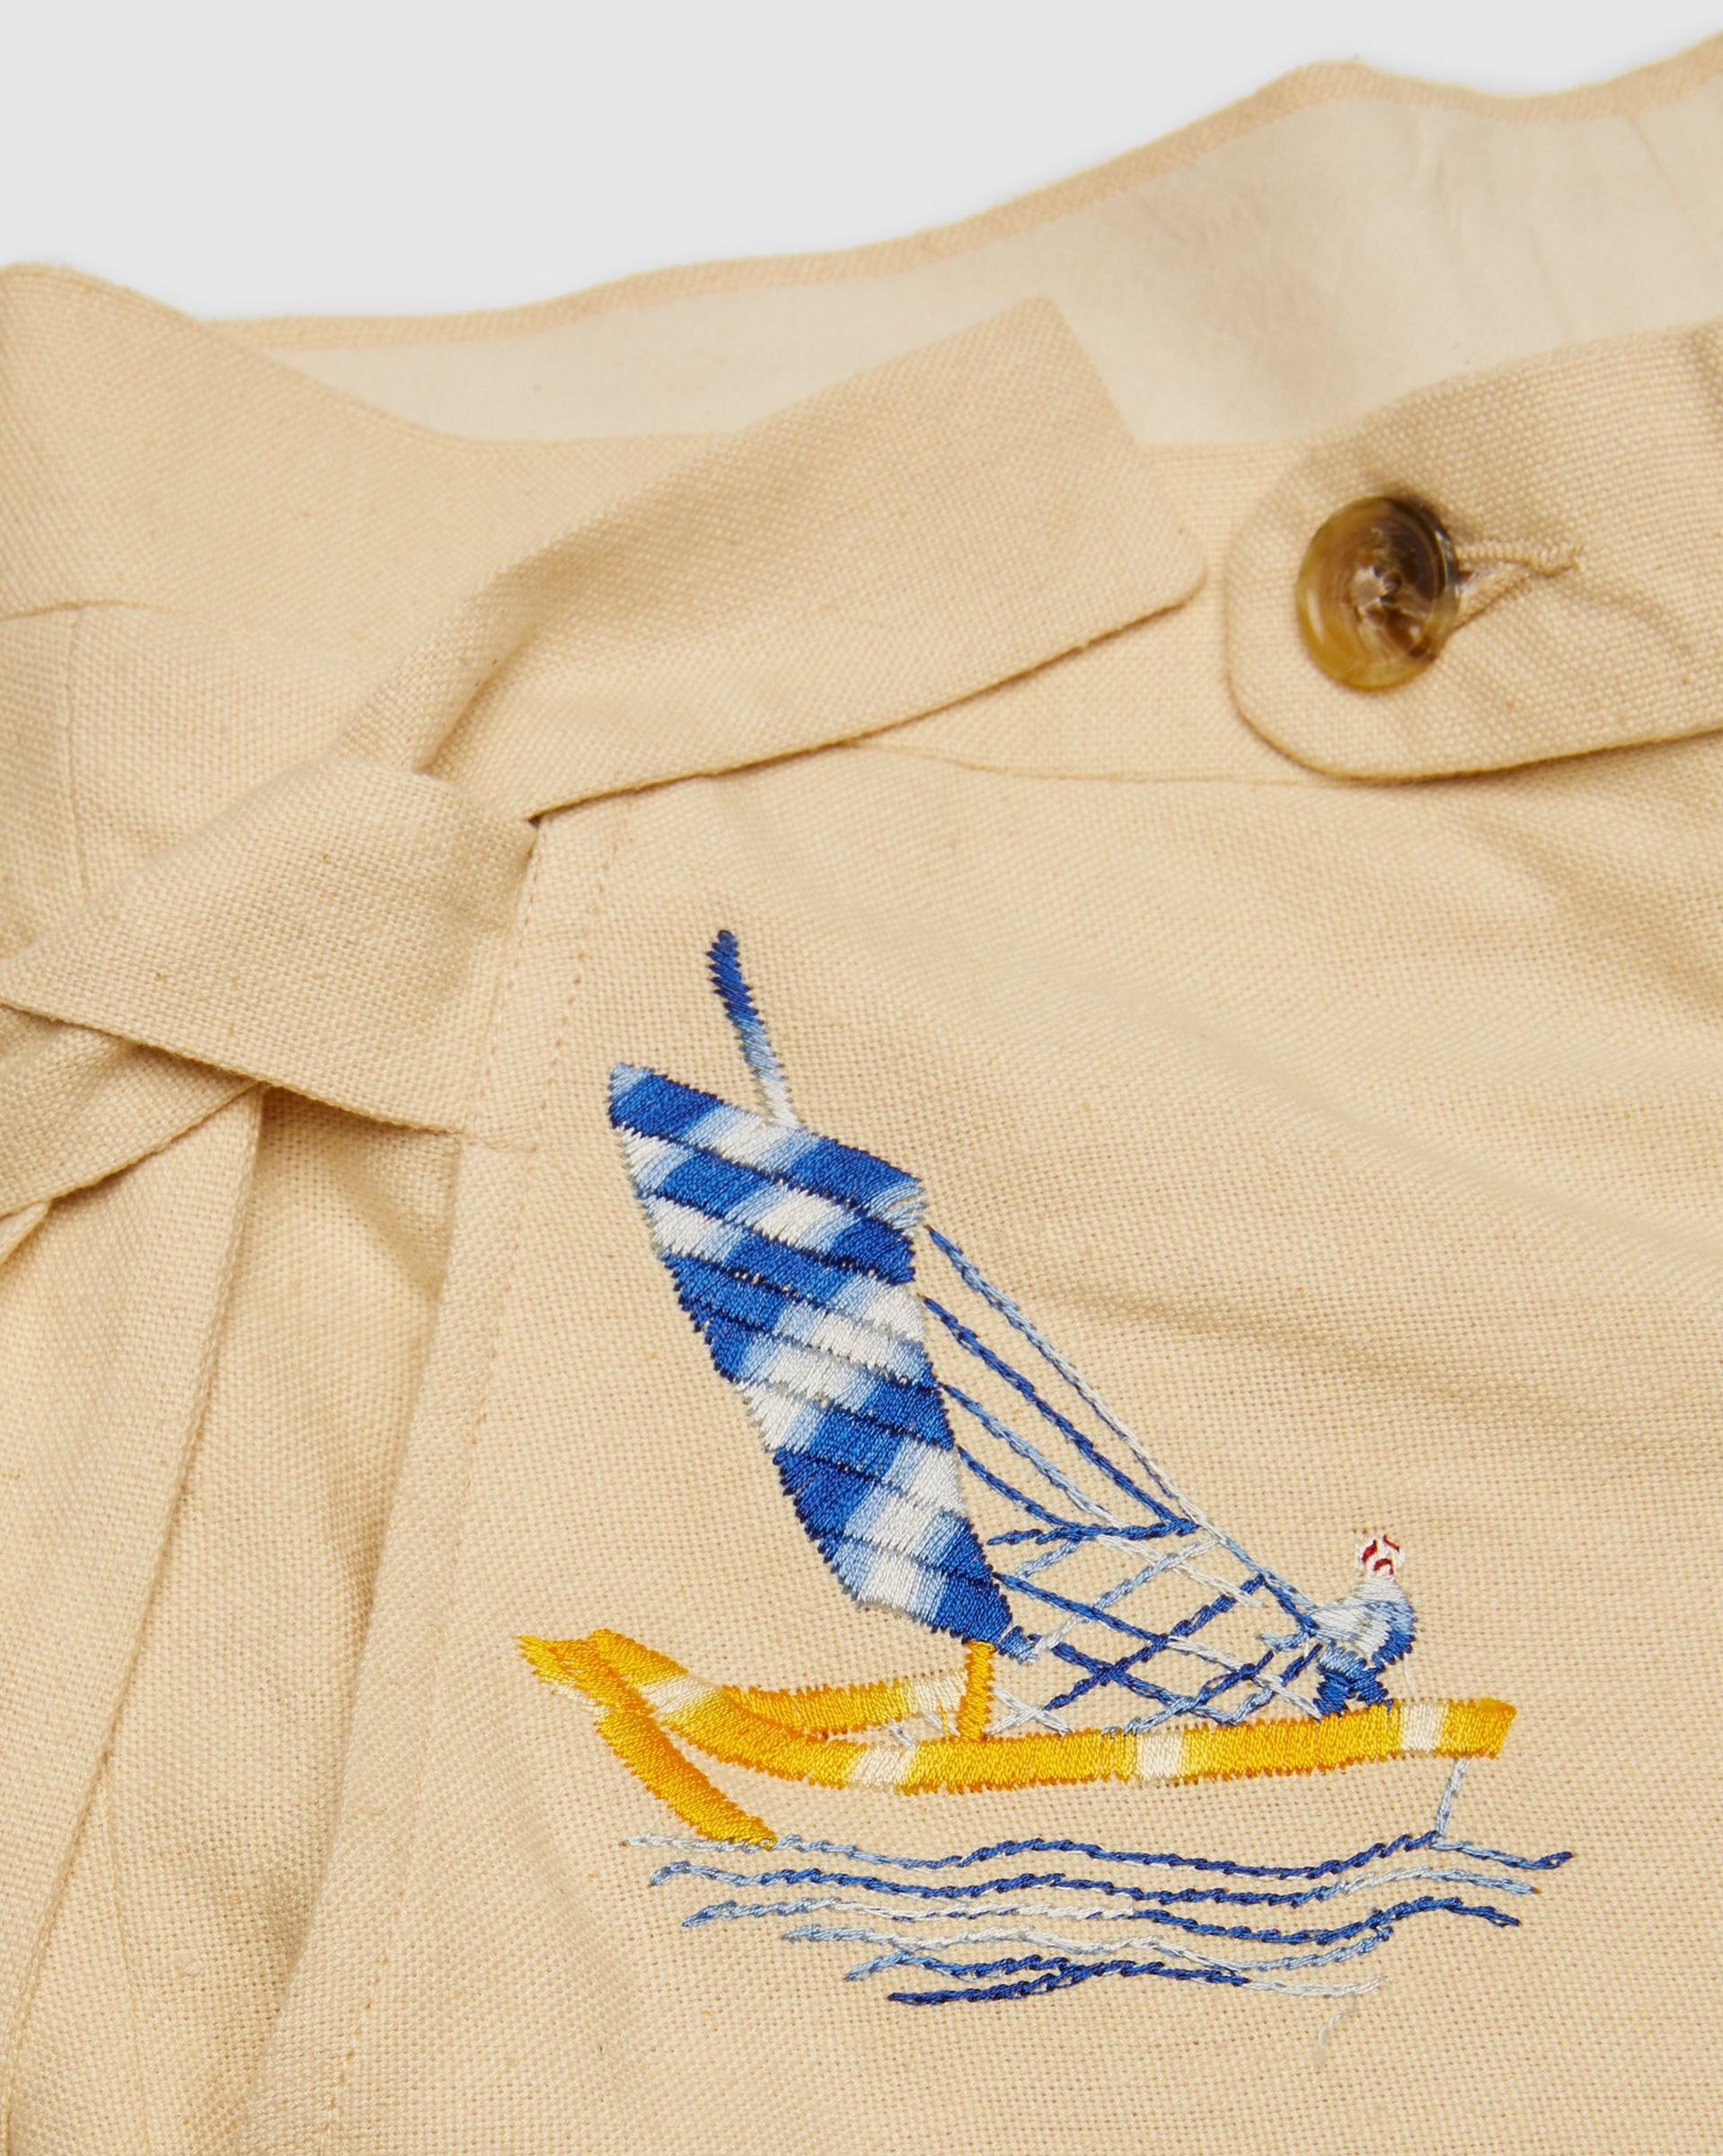 BODE - Sailing Tableau Trousers Tan - Image 3